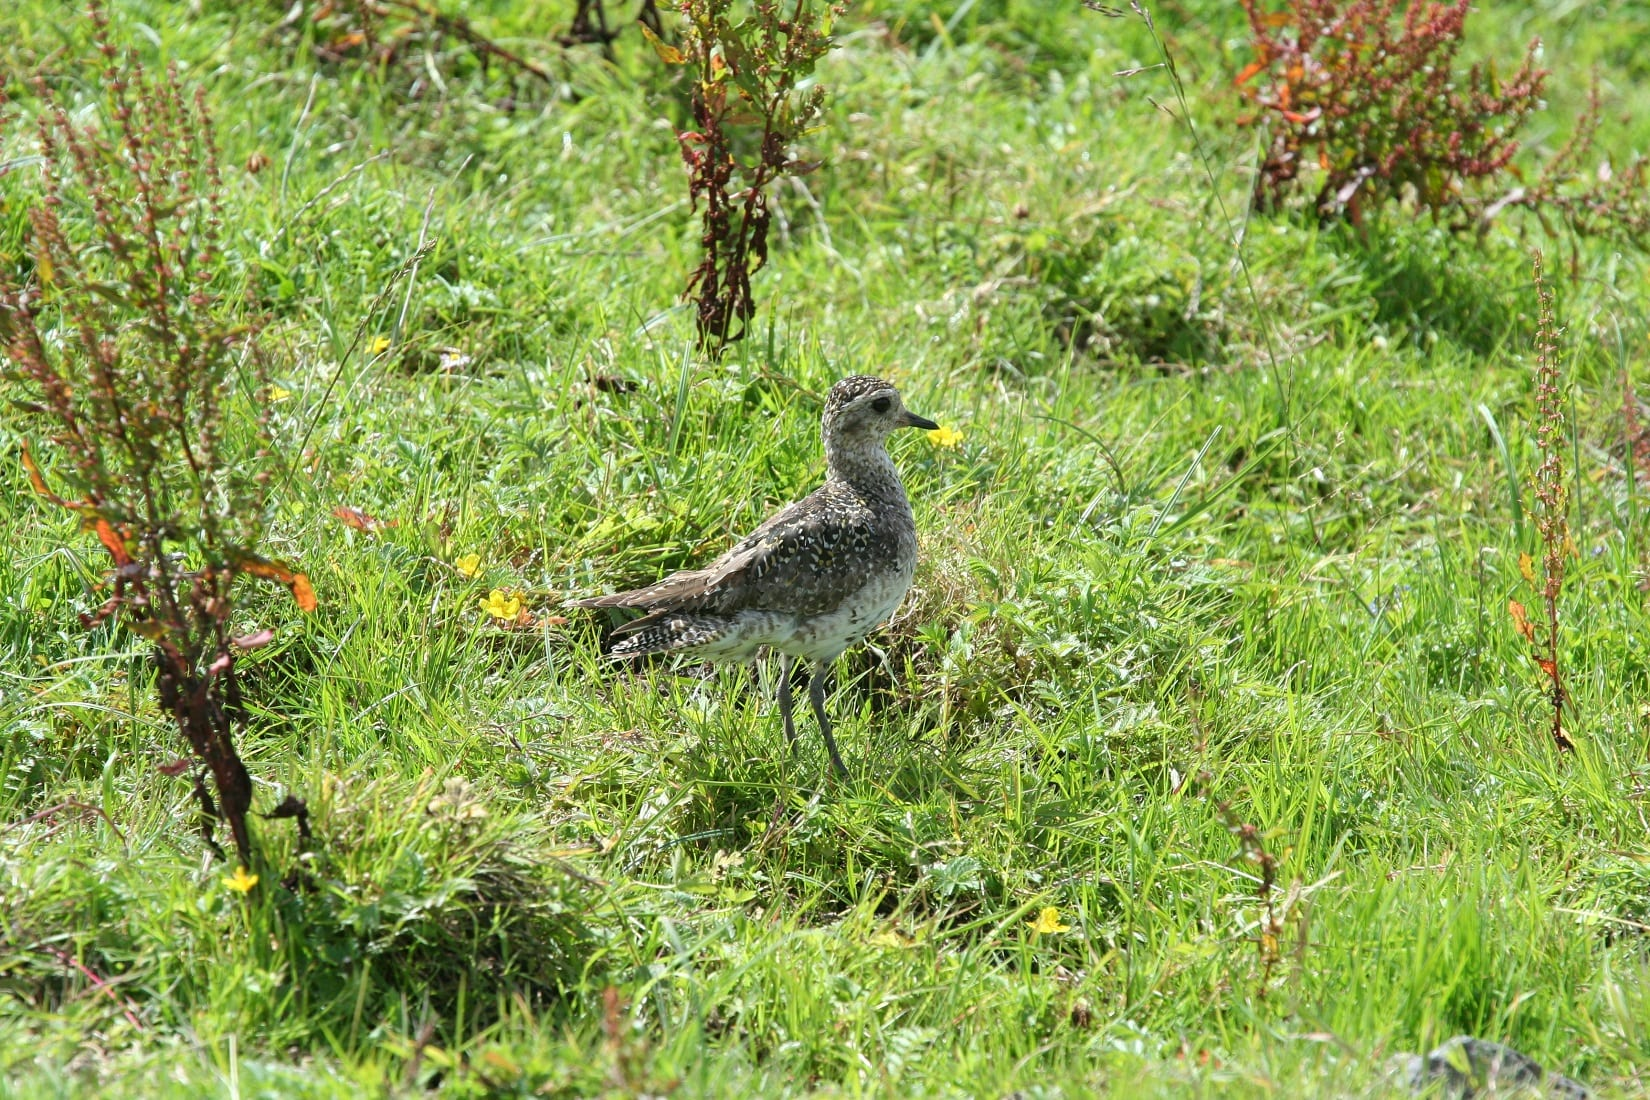 juvenile-golden-plover-standing-in-field